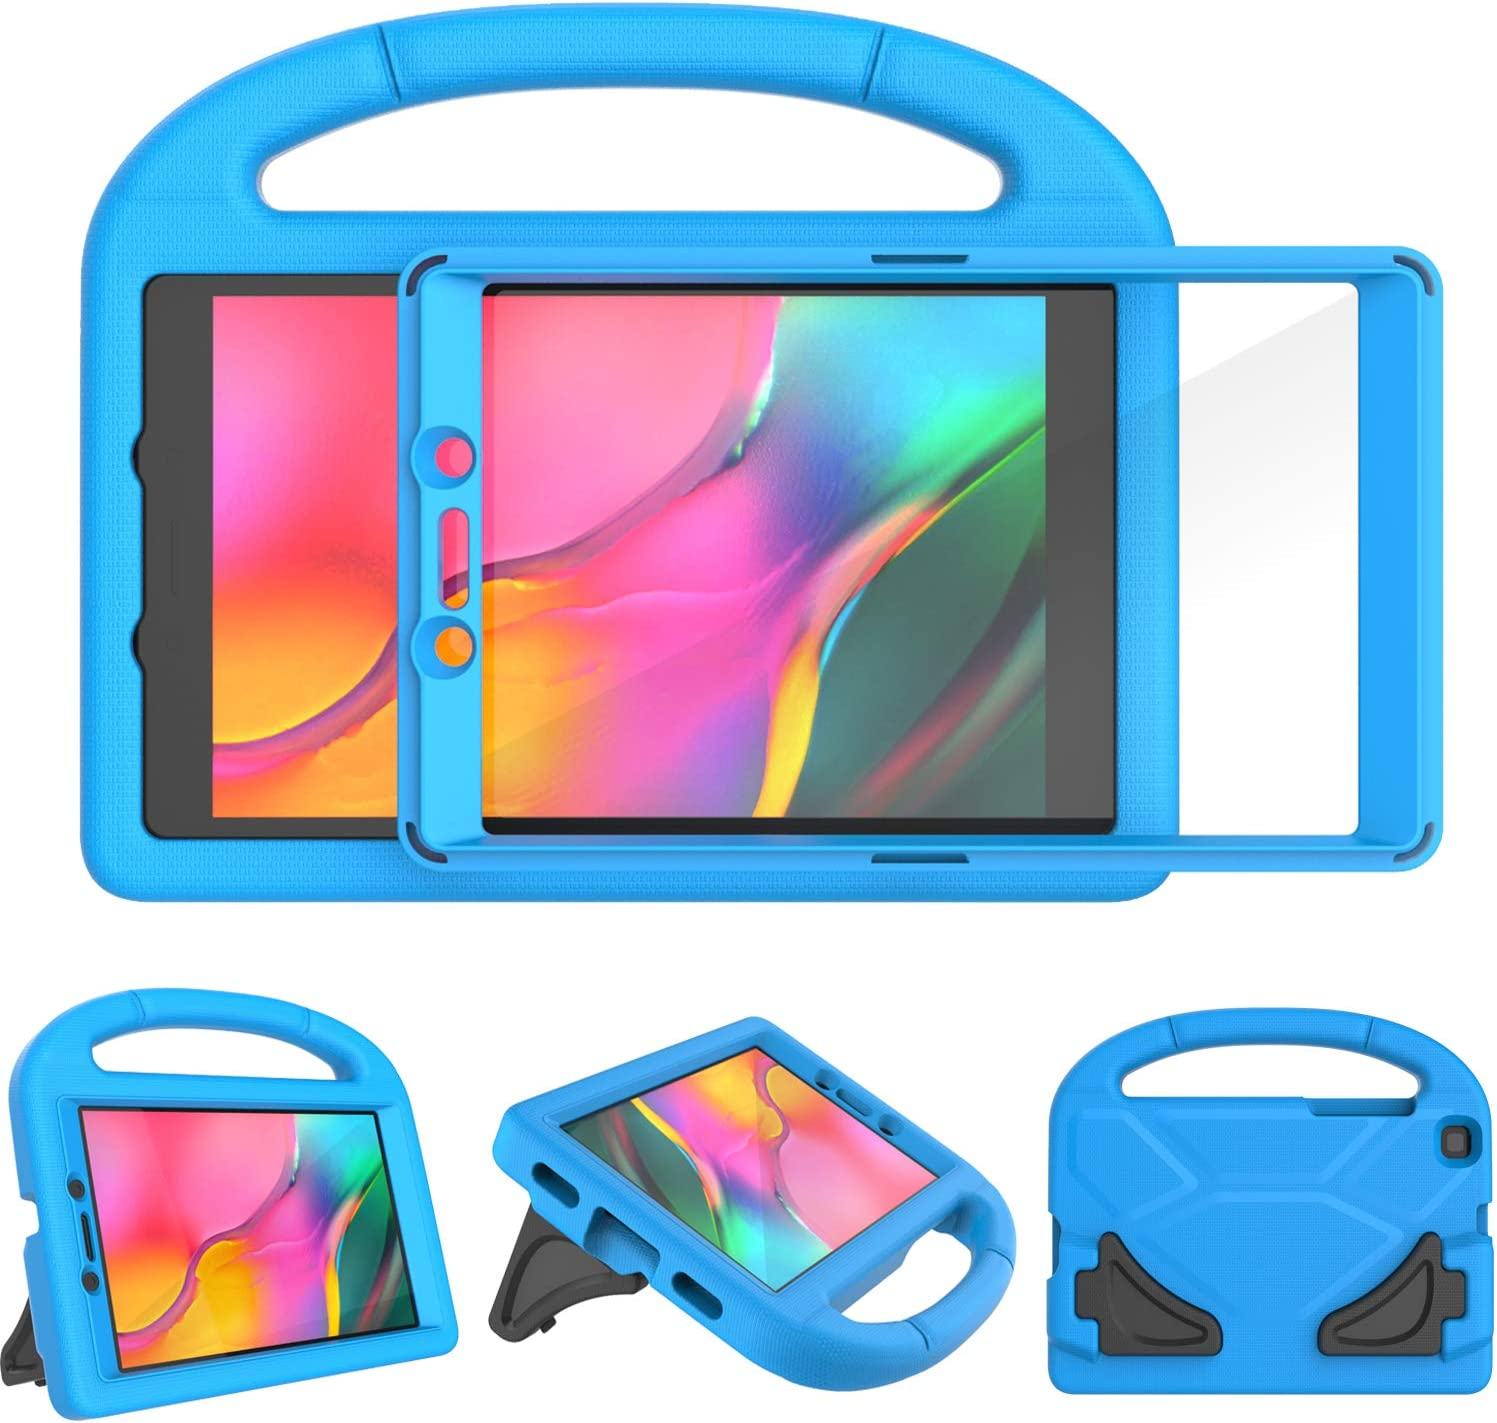 Funda niños para Samsung Galaxy Tab A 8.0 2019